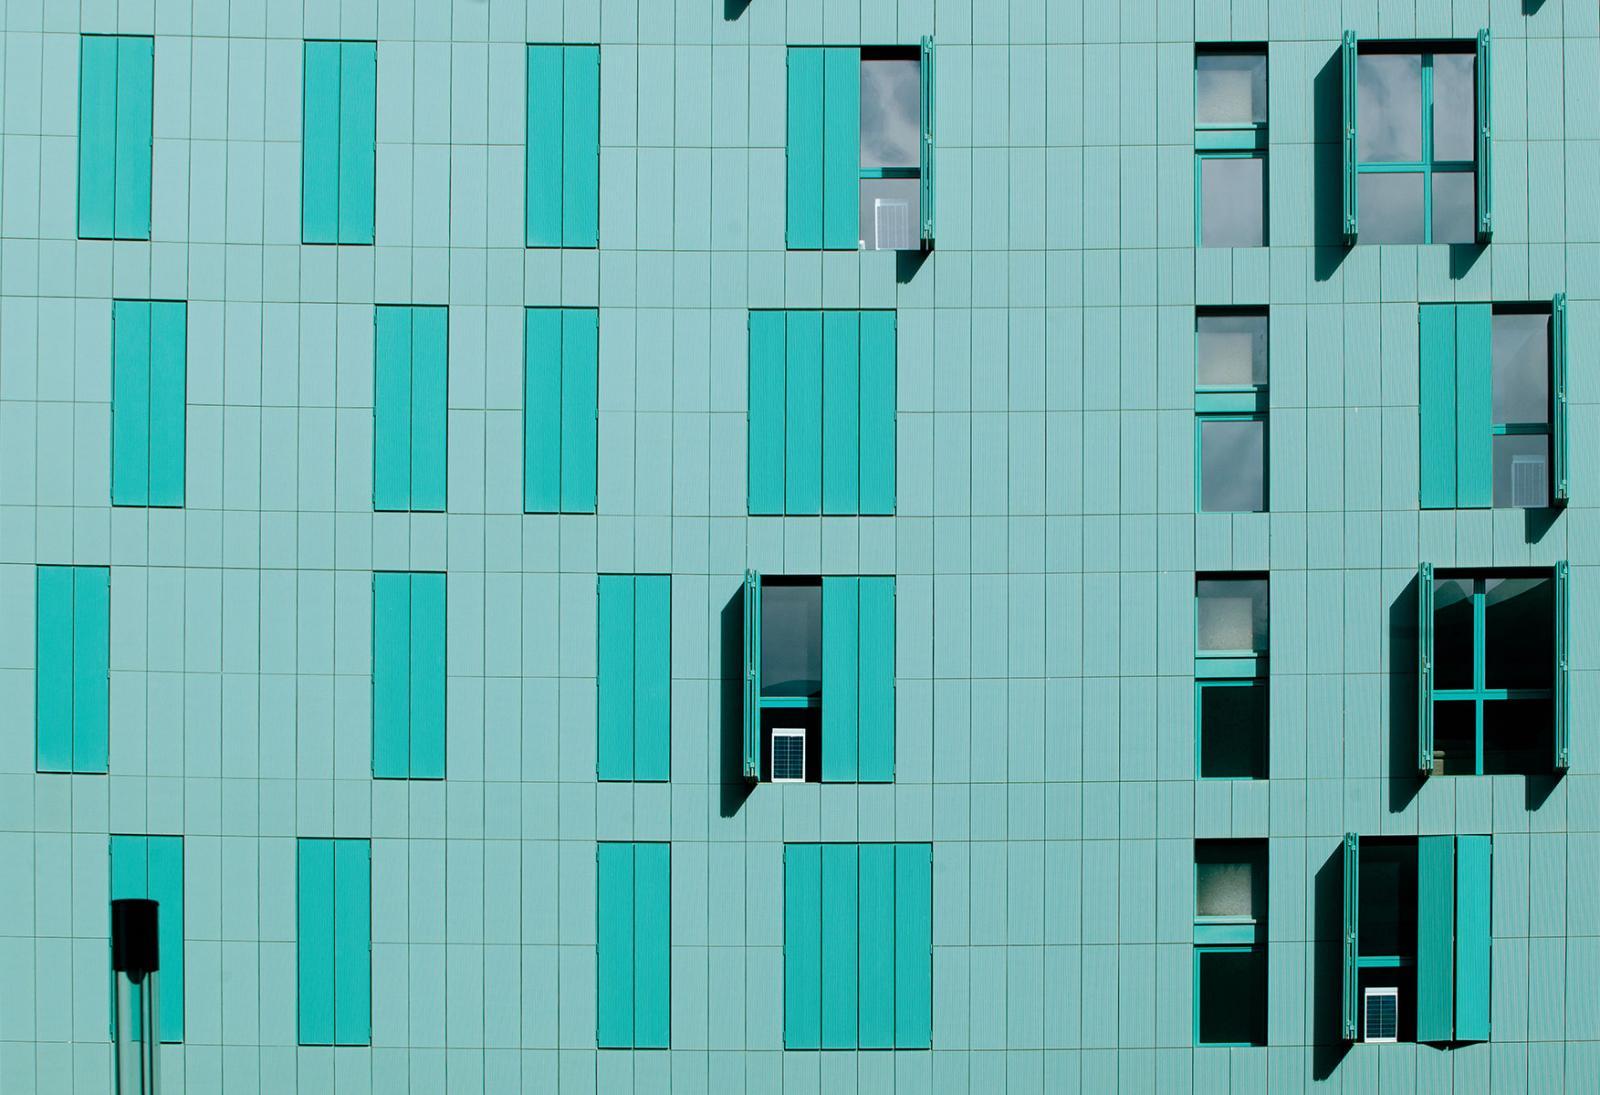 detalle fachadas ventanas DolceStone Toyo Ito